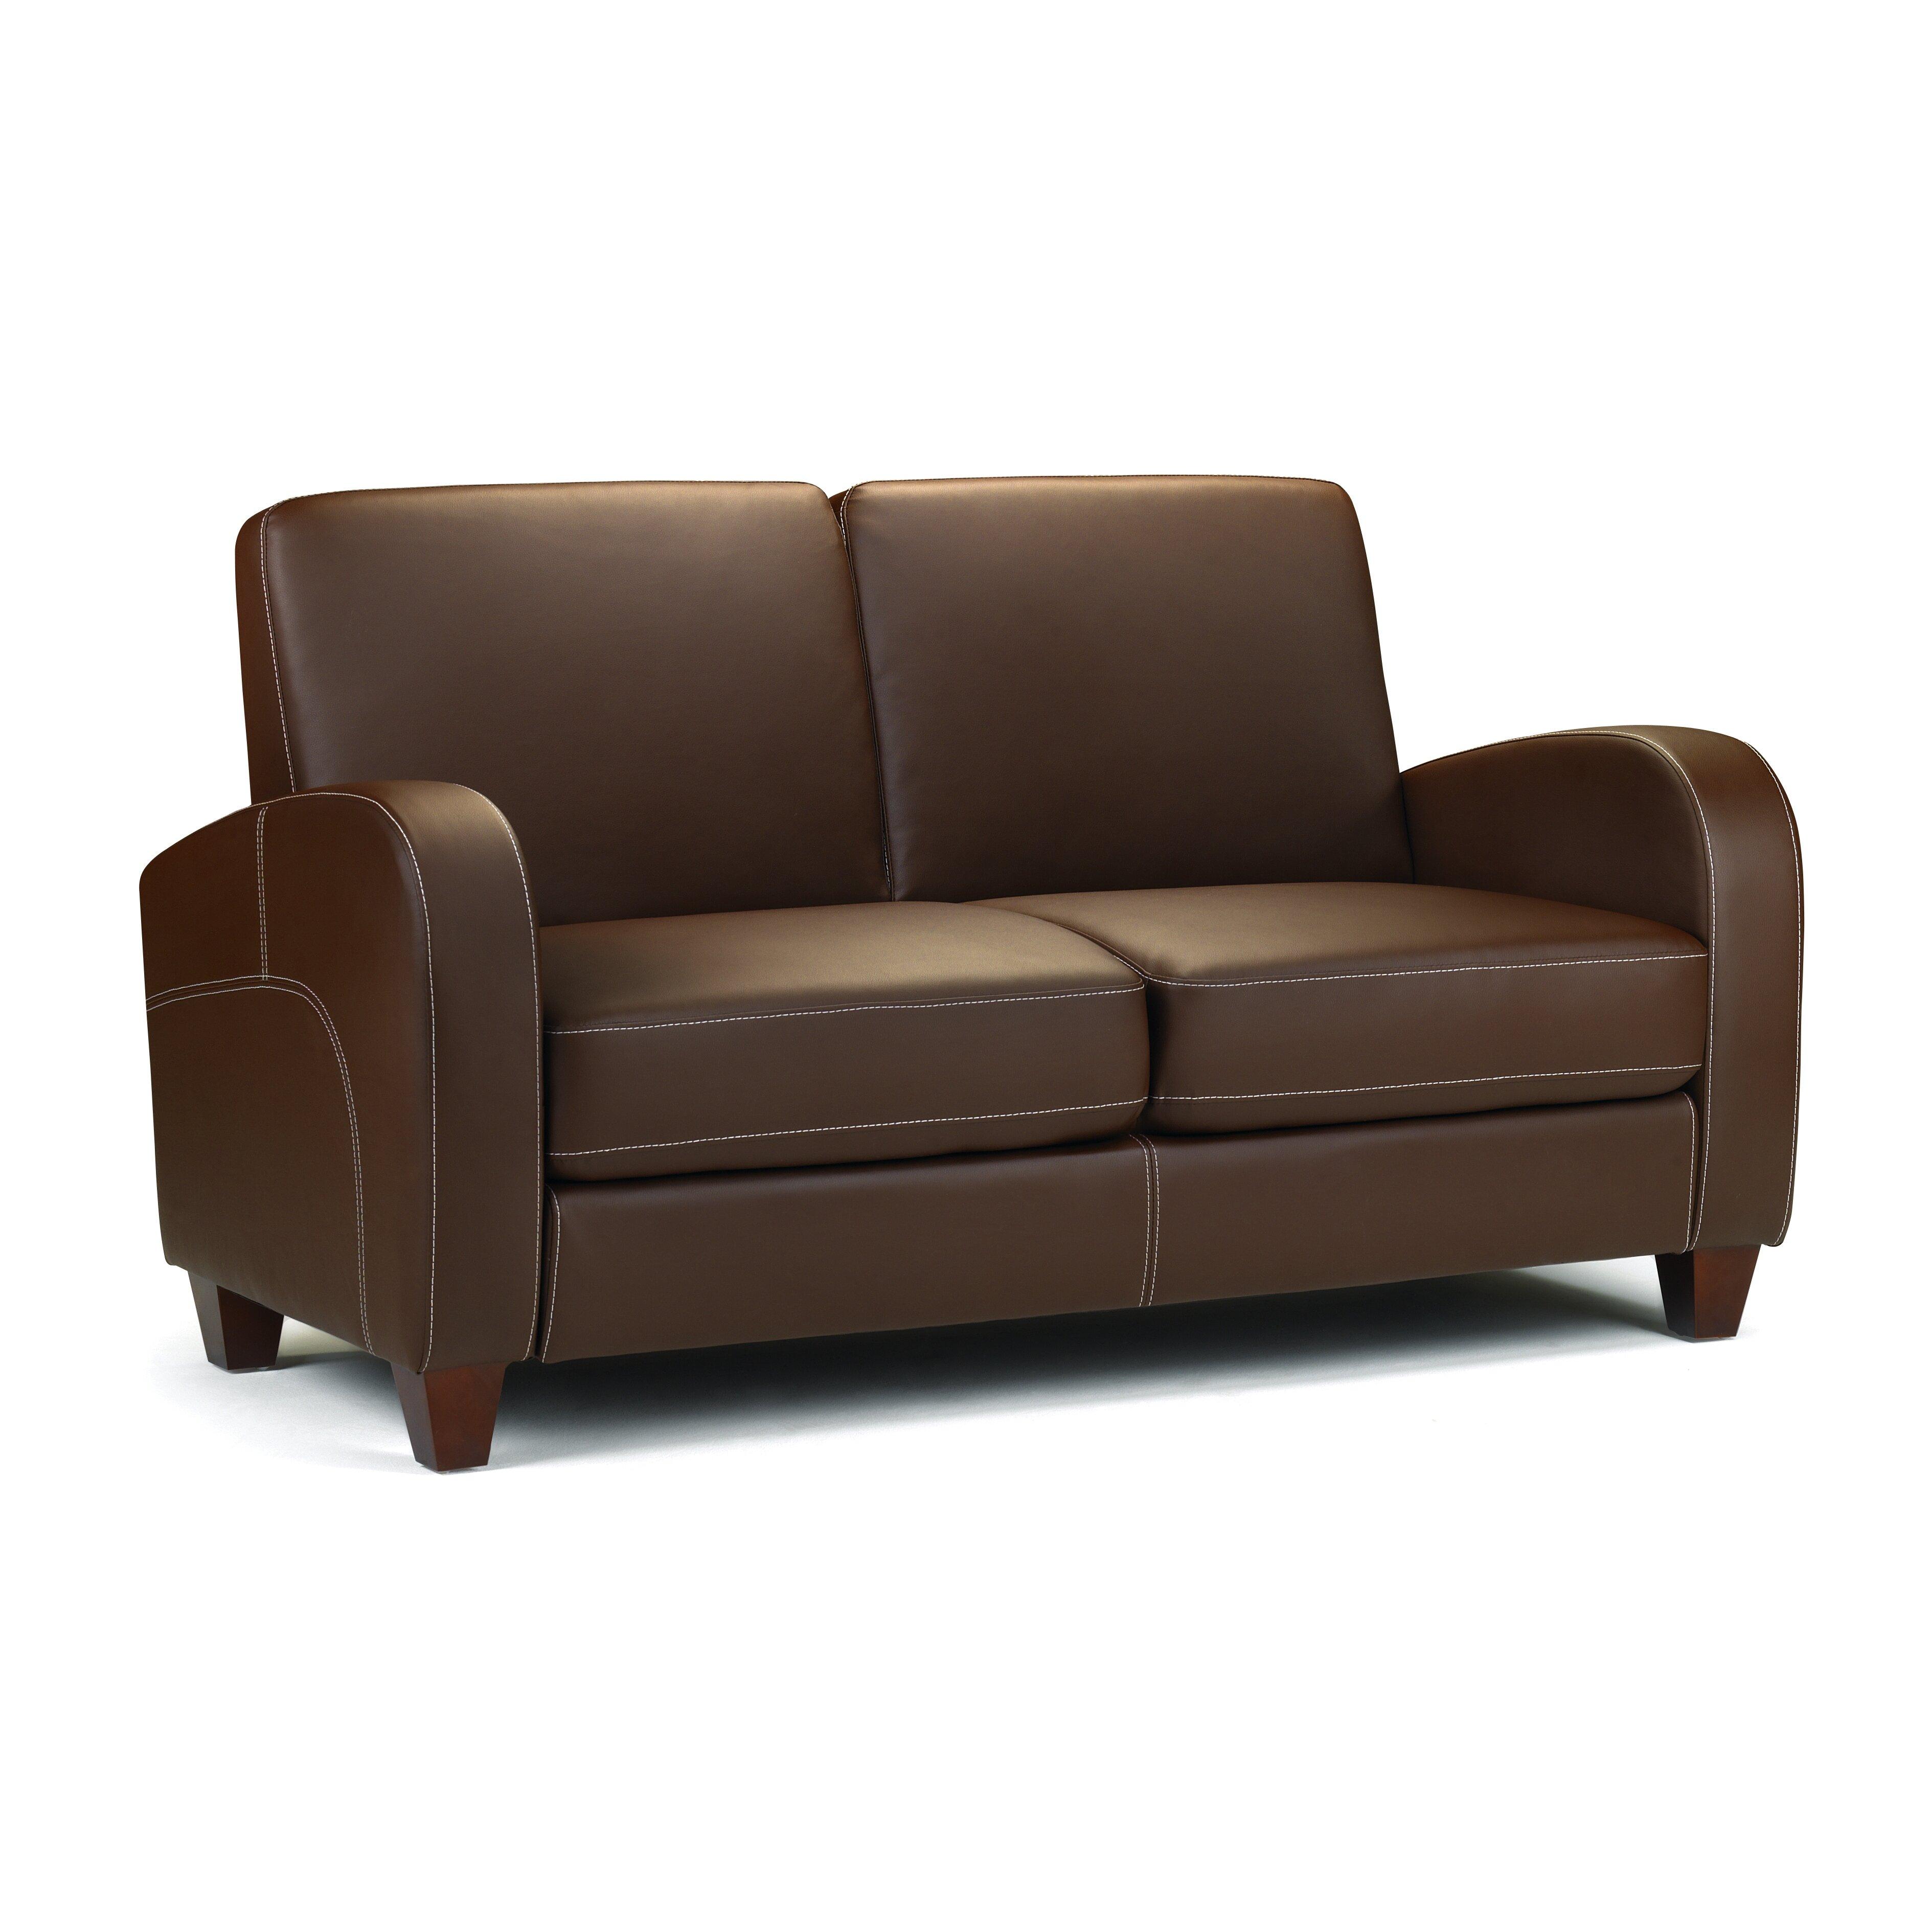 Andover mills judith 2 seater sofa reviews wayfair uk for Bedroom 2 seater sofa